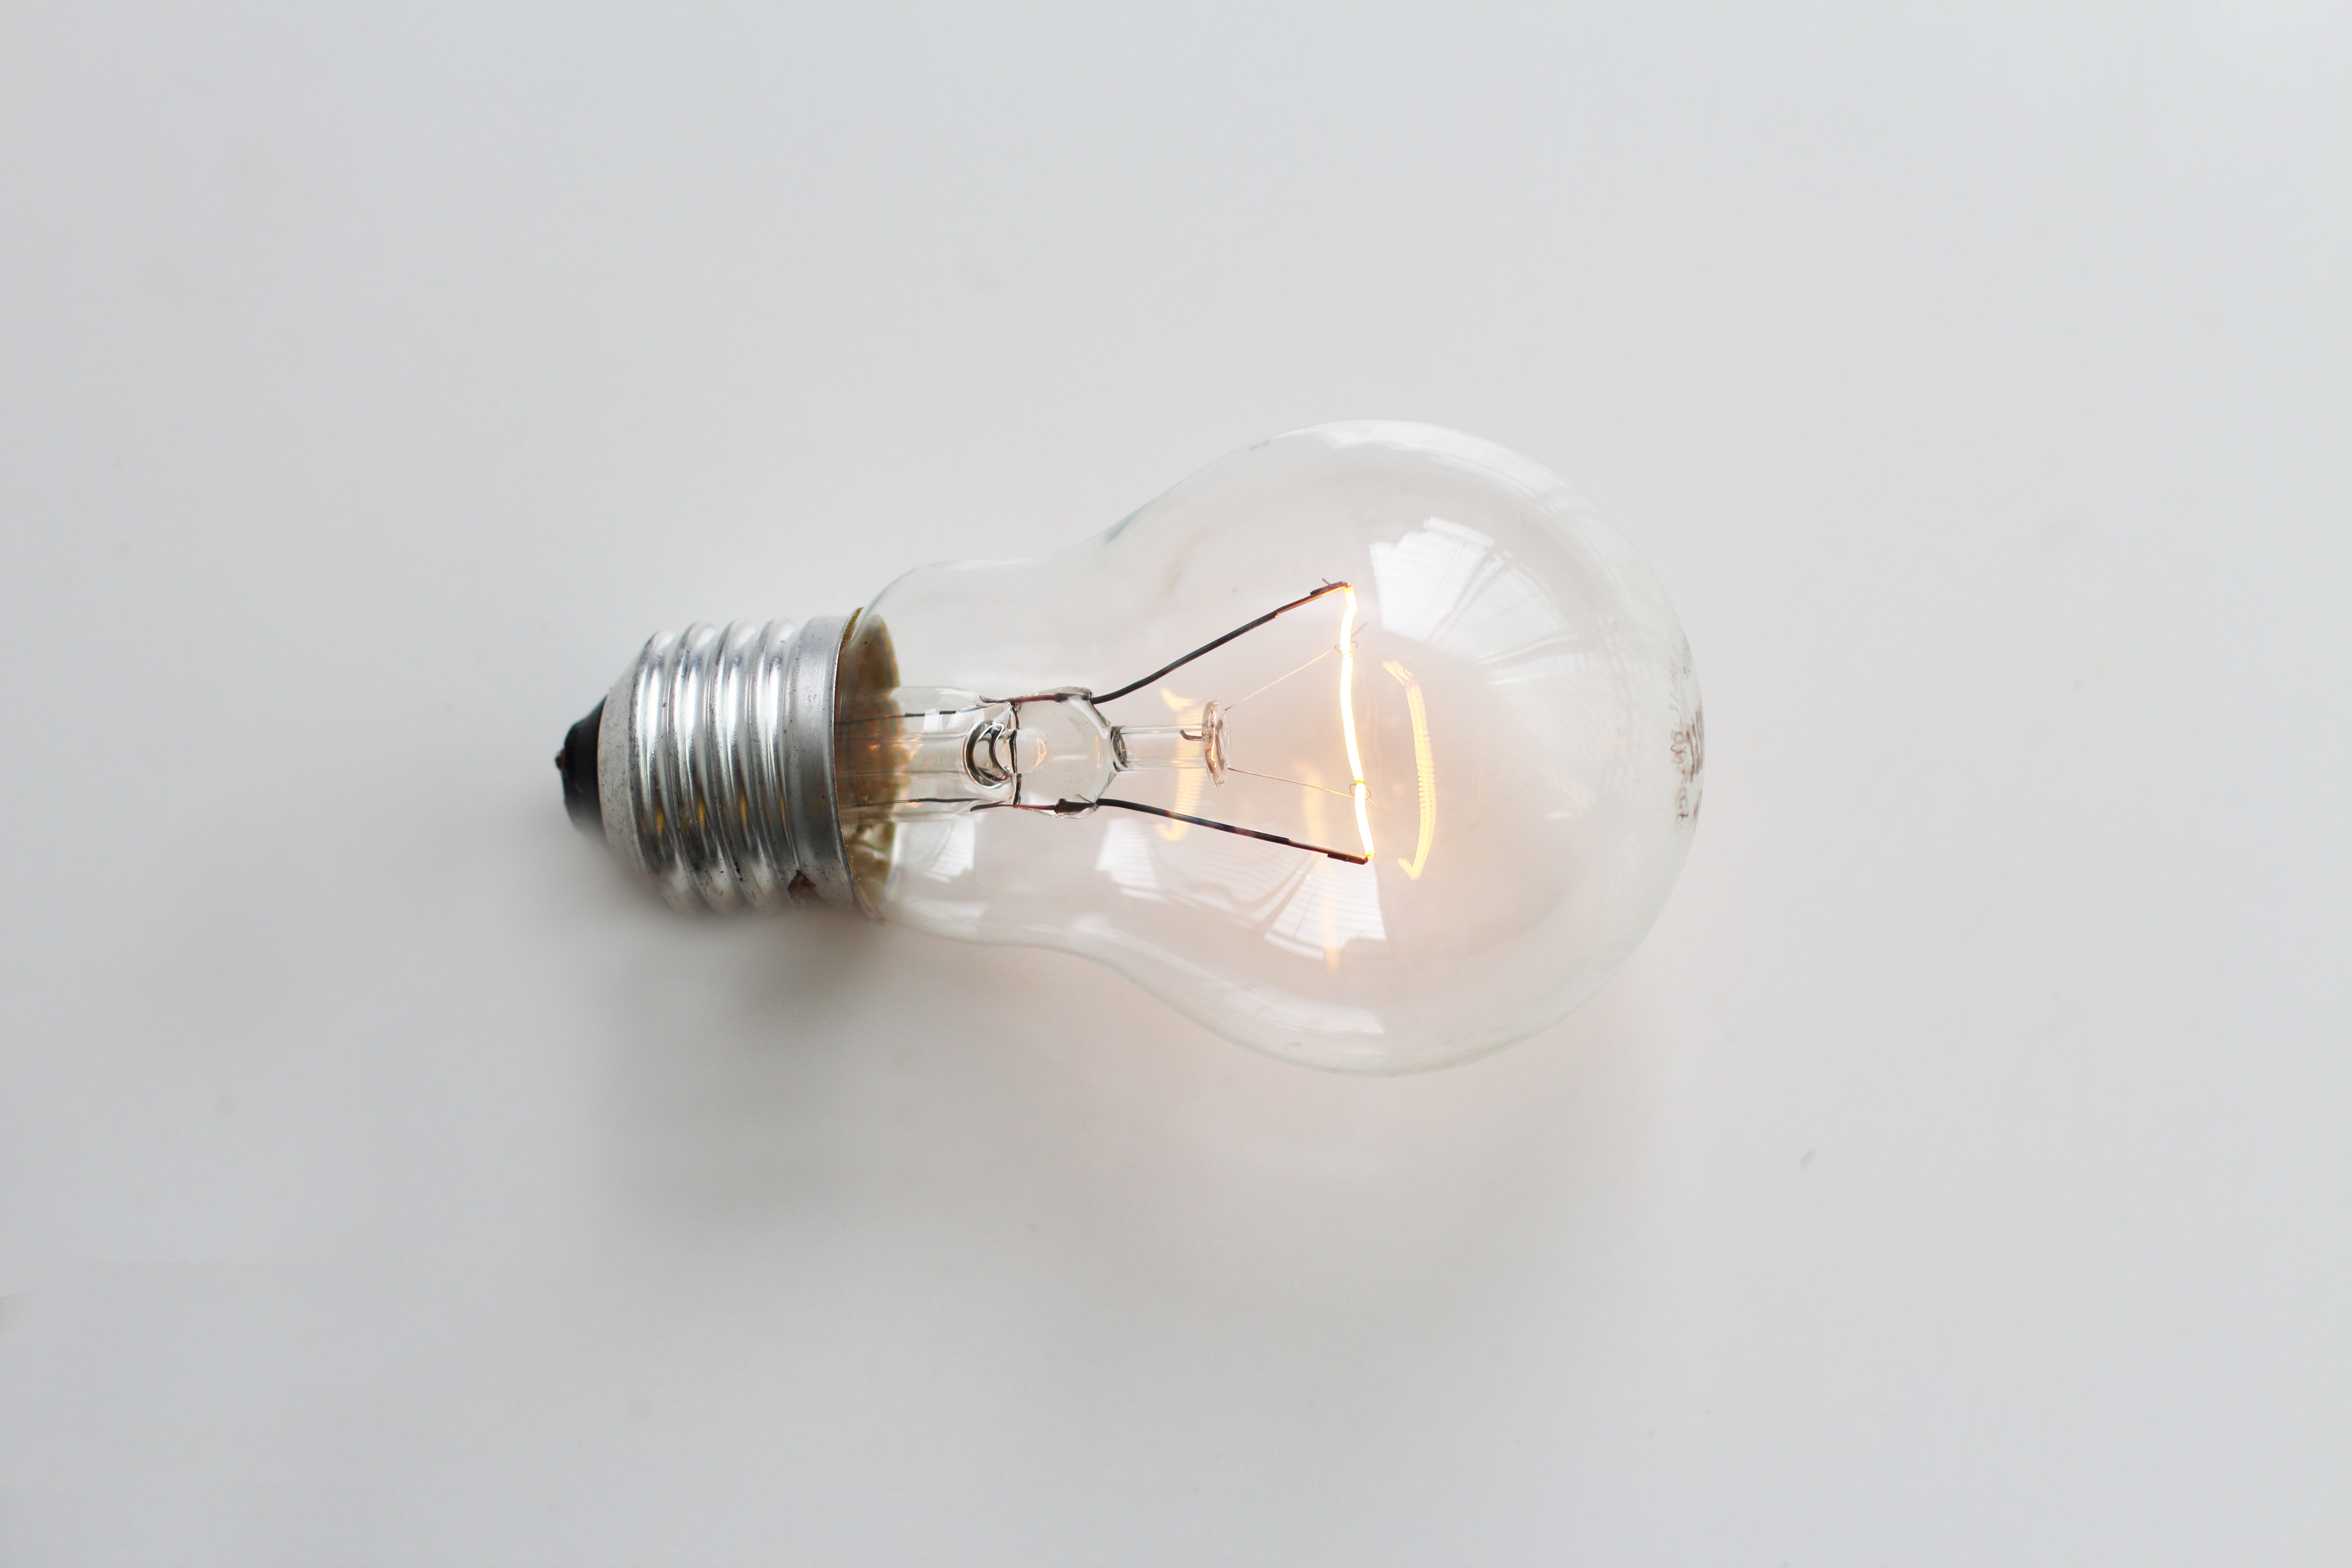 electricitat5184